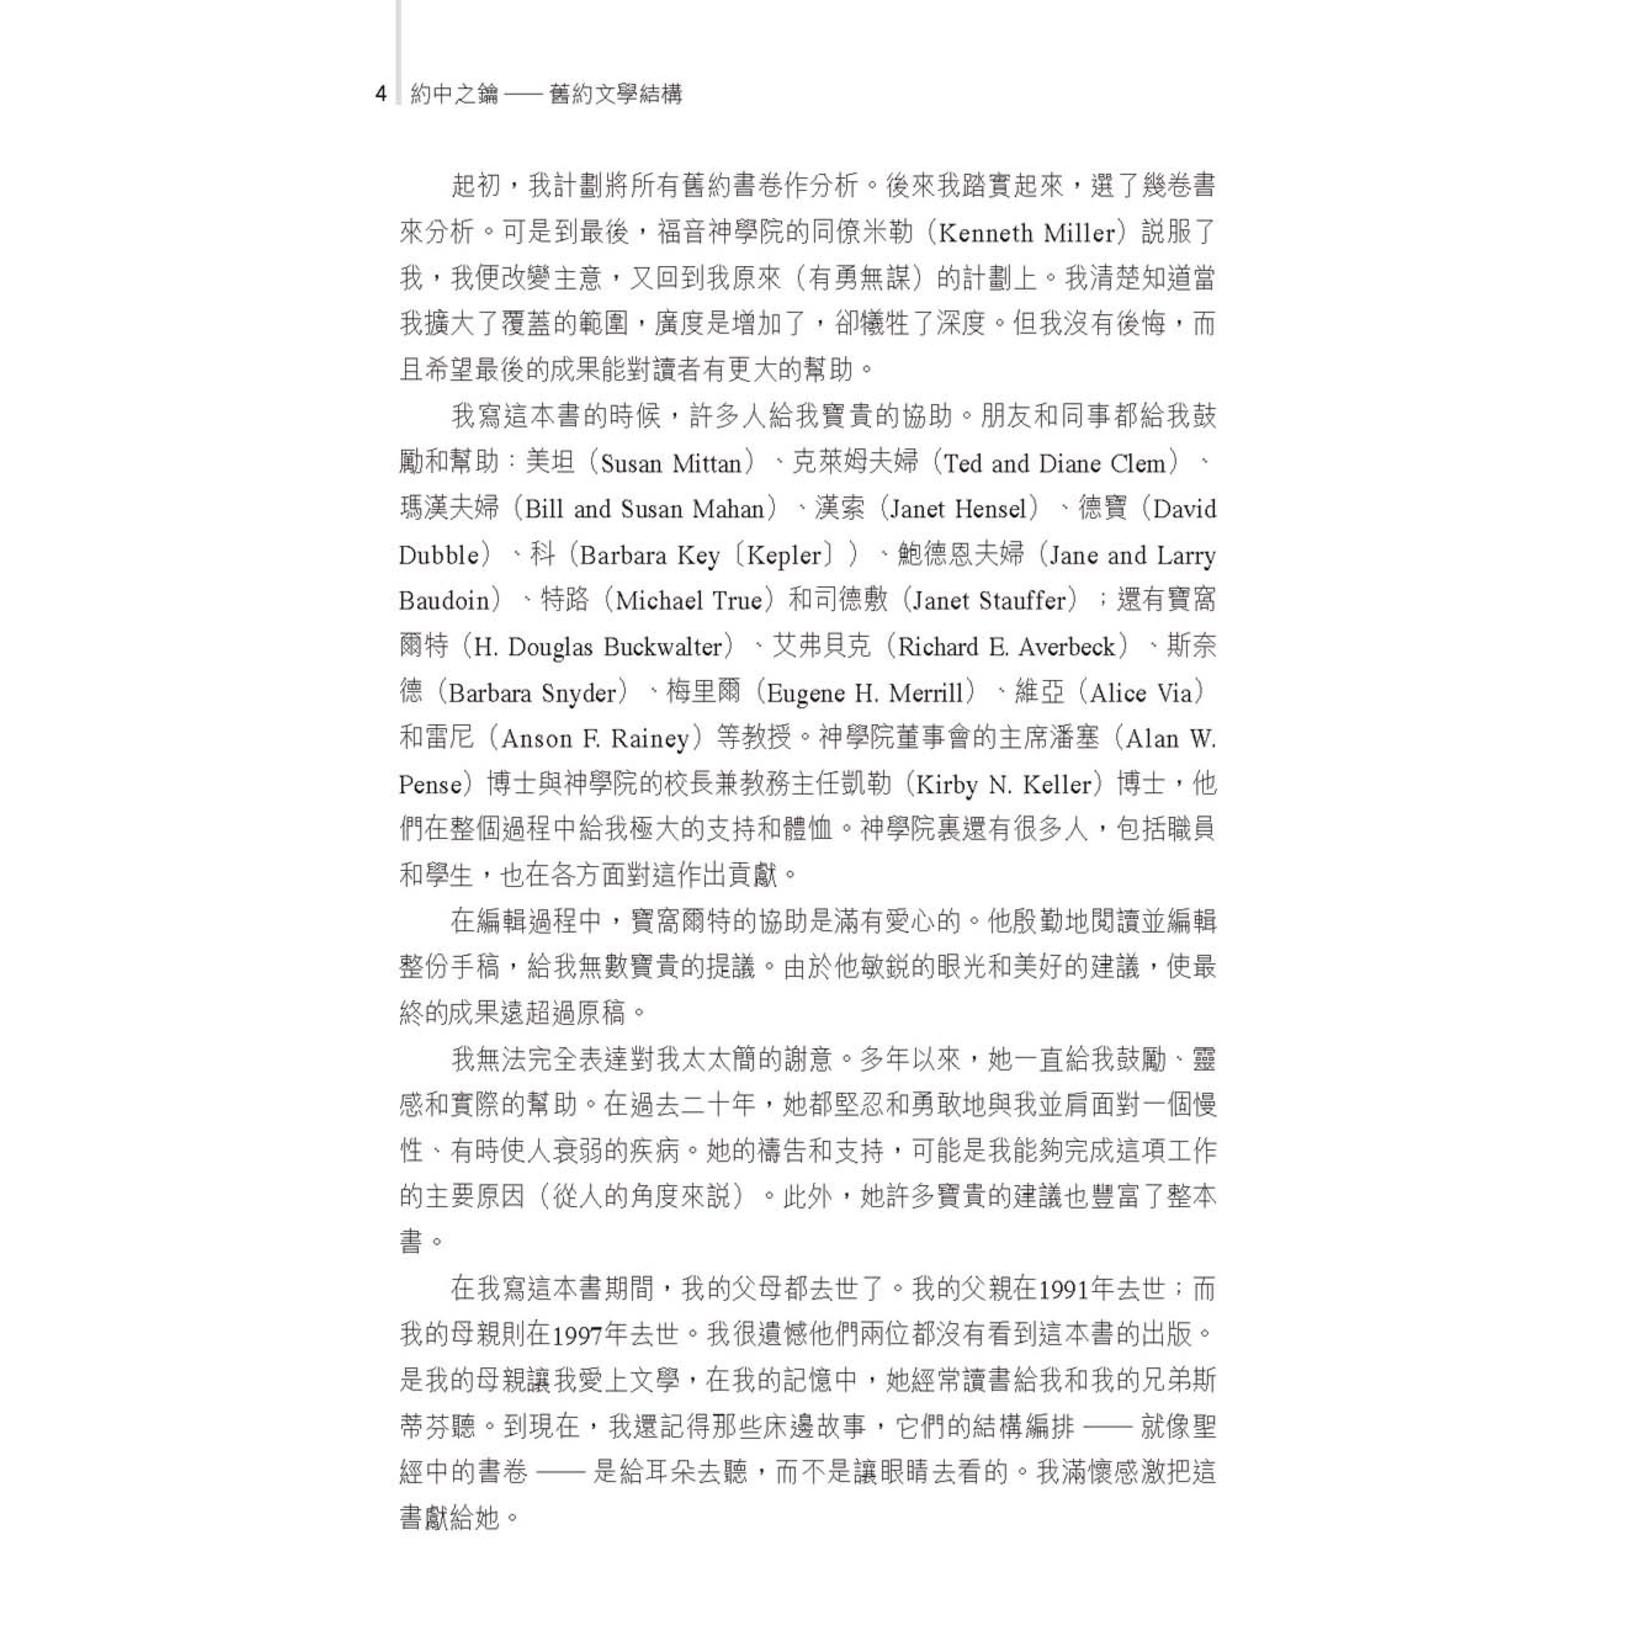 漢語聖經協會 Chinese Bible International 約中之鑰:舊約文學結構 The Literary Structure of the Old Testament